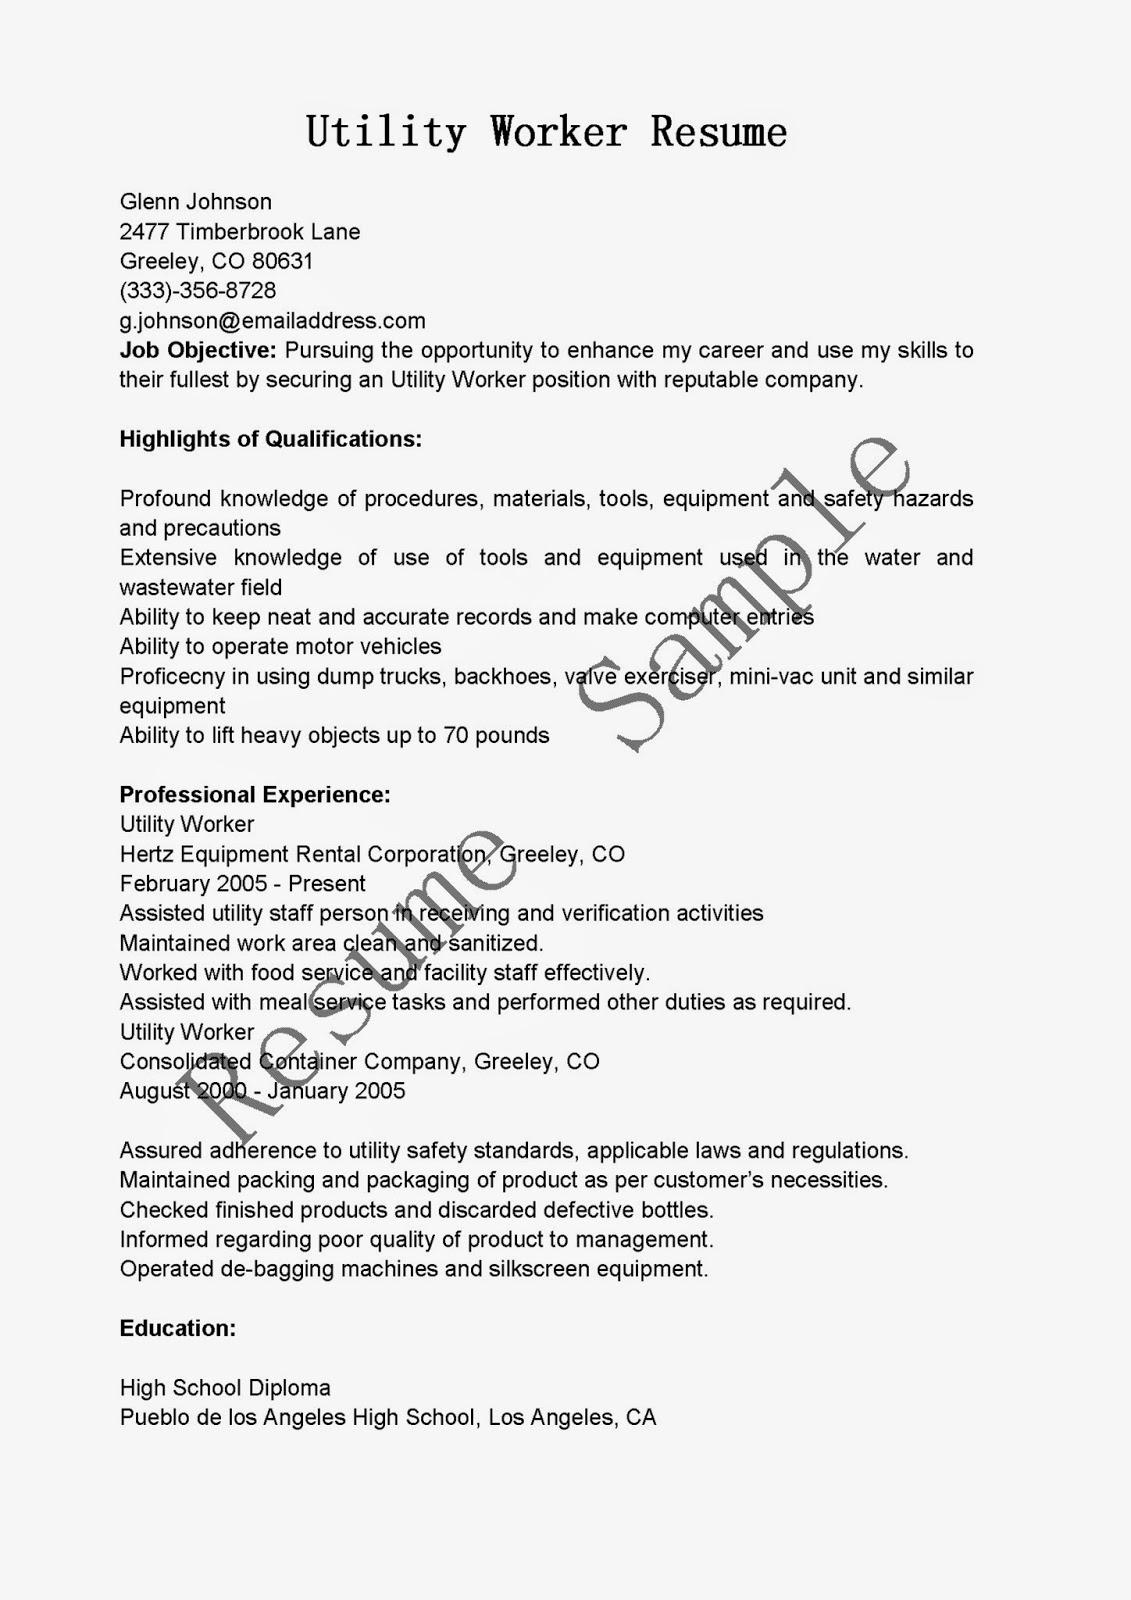 resume samples  utility worker resume sample